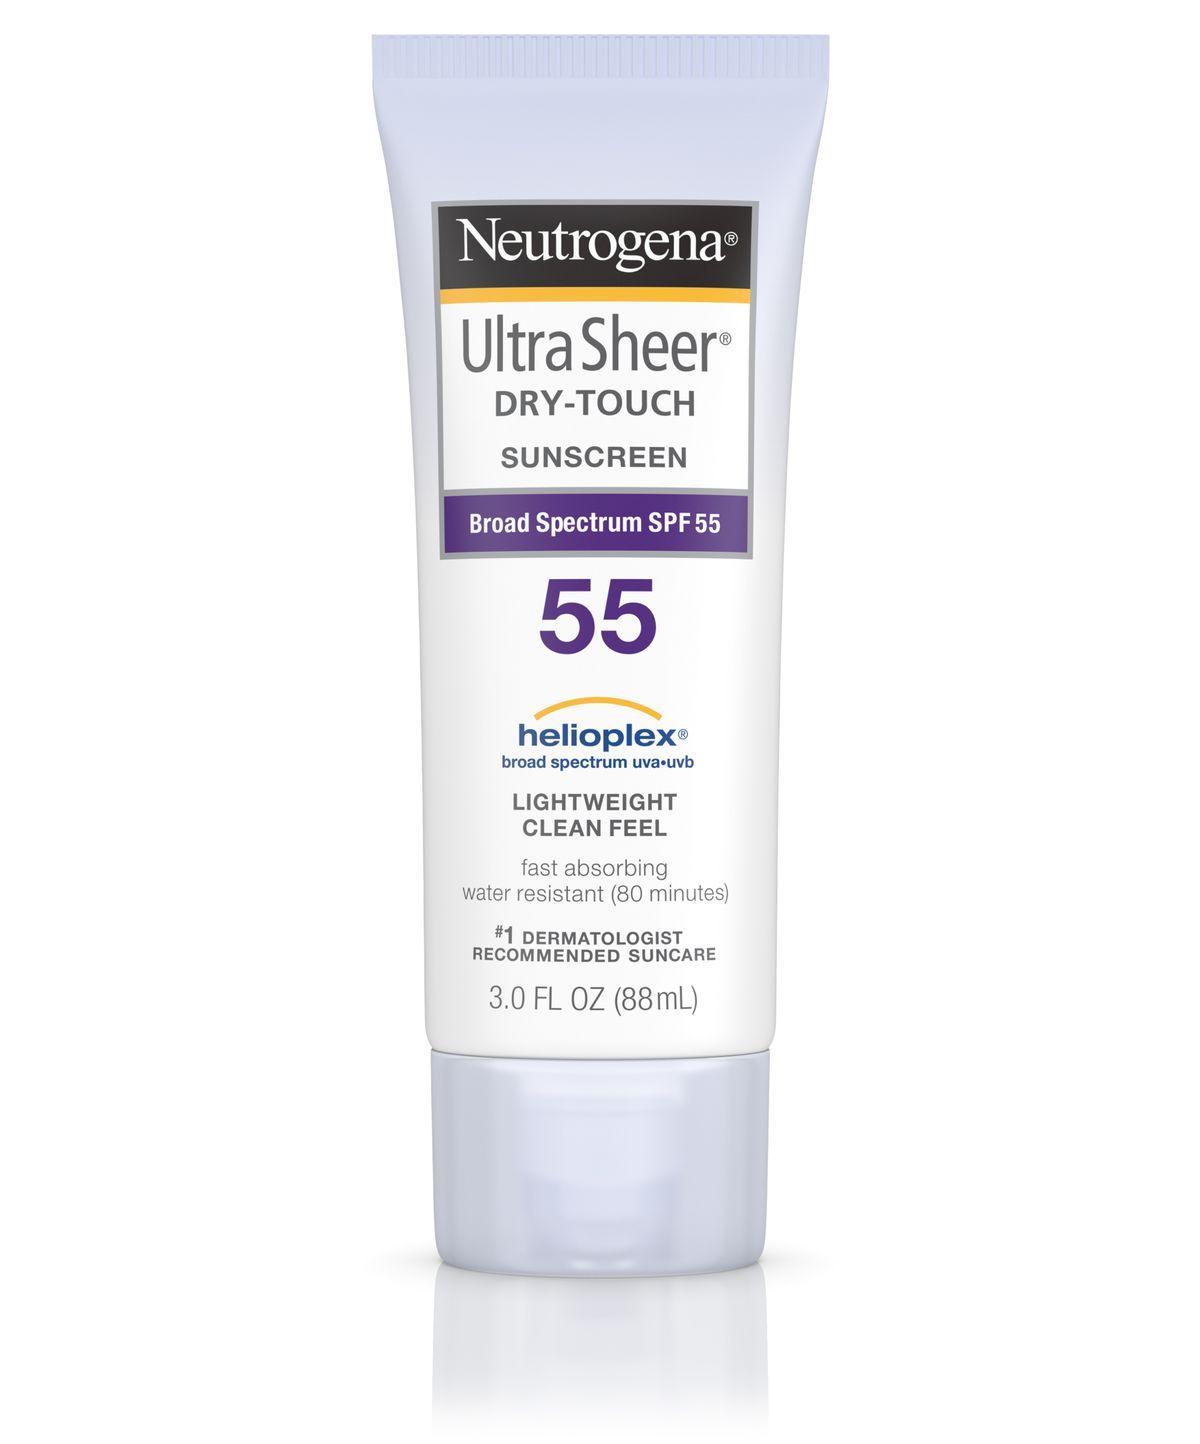 Kem chống nắng Neutrogena SPF 55 Ultra Sheer Dry Touch Sunscreen